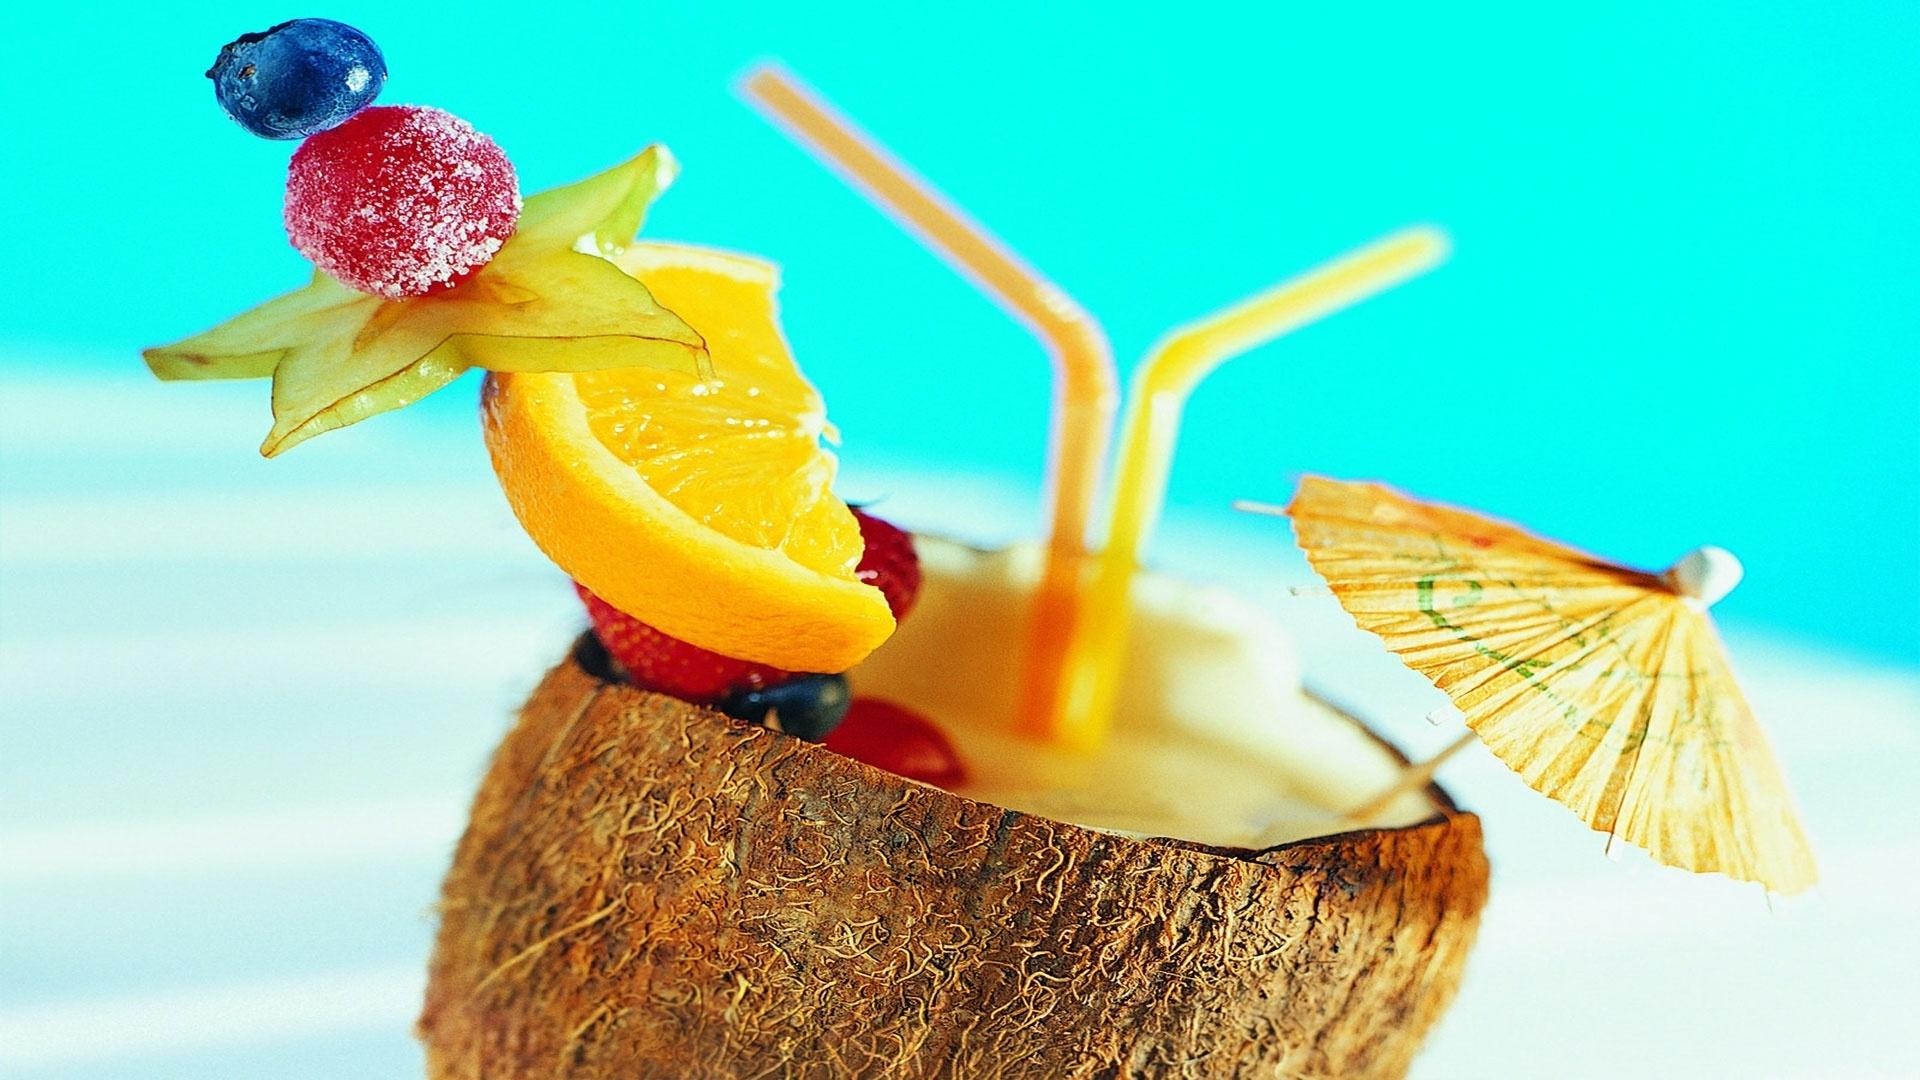 Coconuts By The Sea 1080p wallpaper